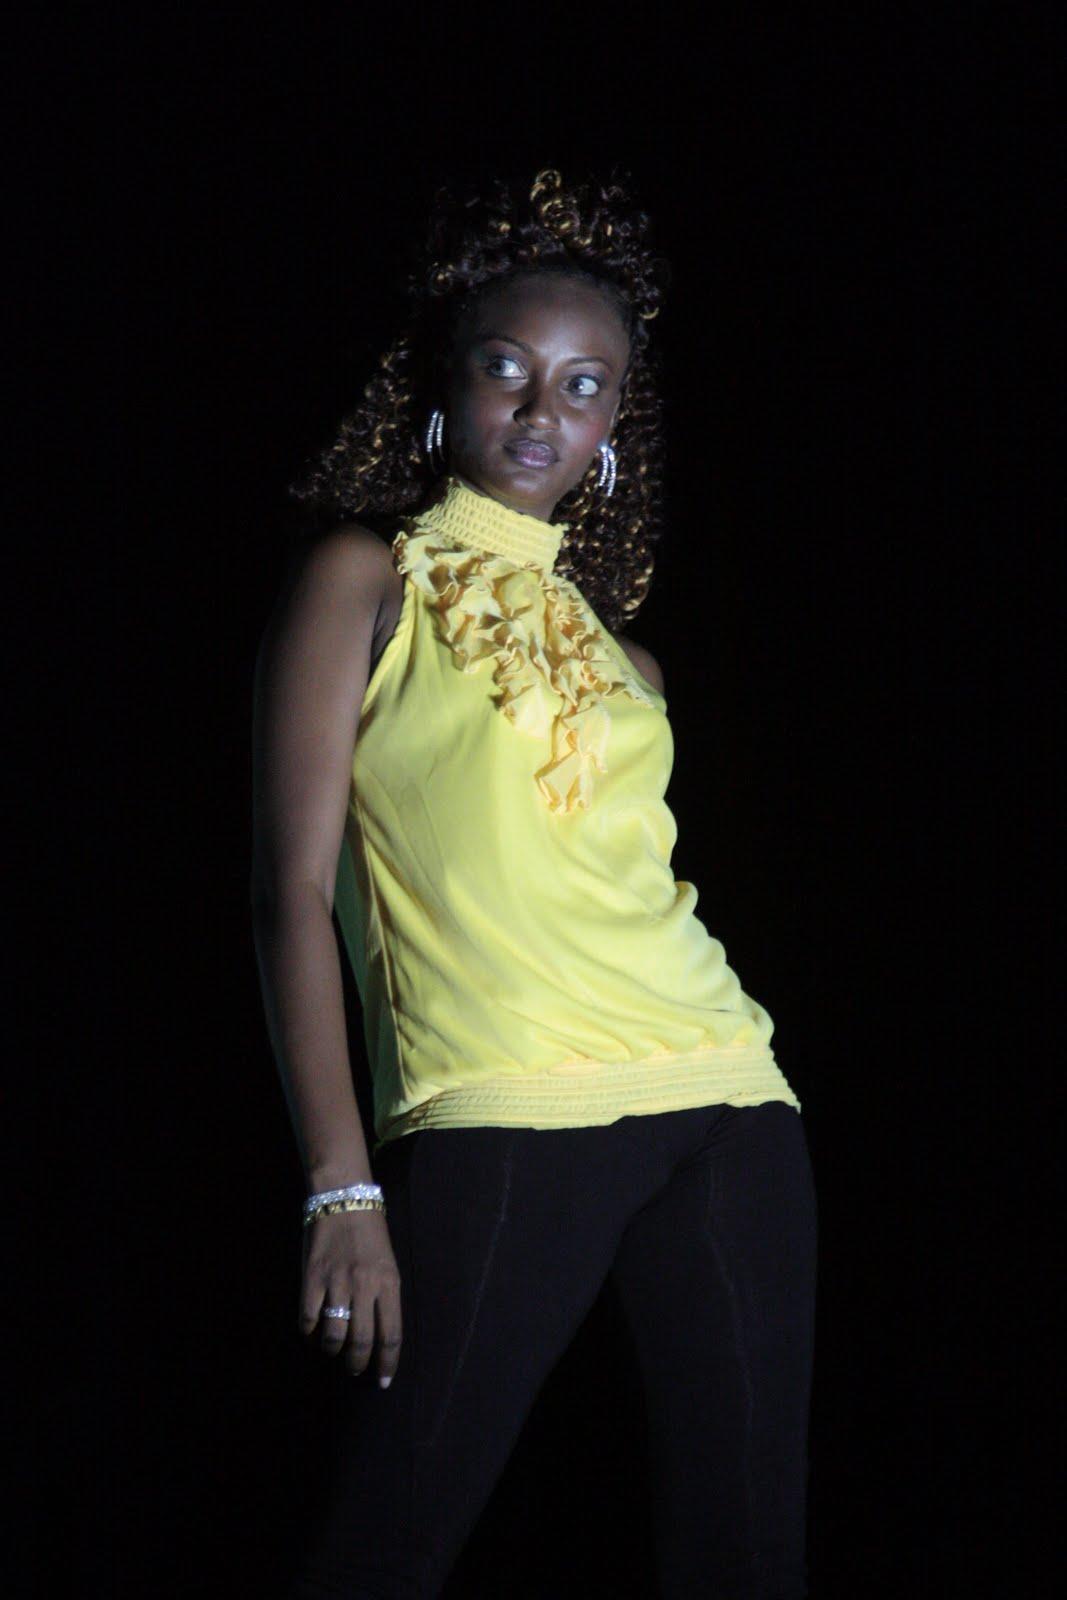 http://2.bp.blogspot.com/_ooer88R7MGA/TEd37sPuitI/AAAAAAAAHm8/DkxnvLBC2NQ/s1600/Picture+143.jpg